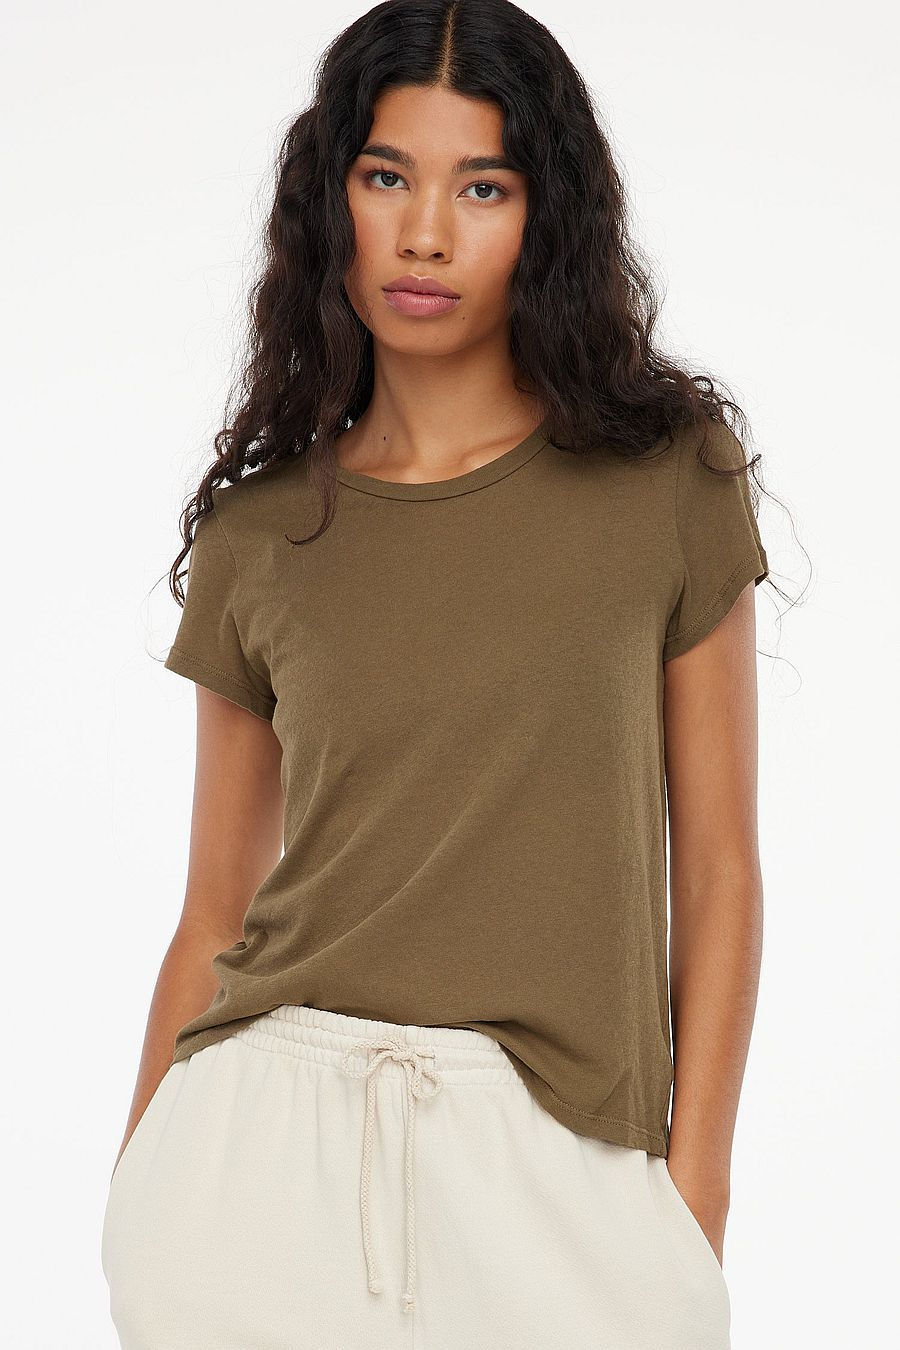 LACAUSA Clothing Frank Tee - Basil